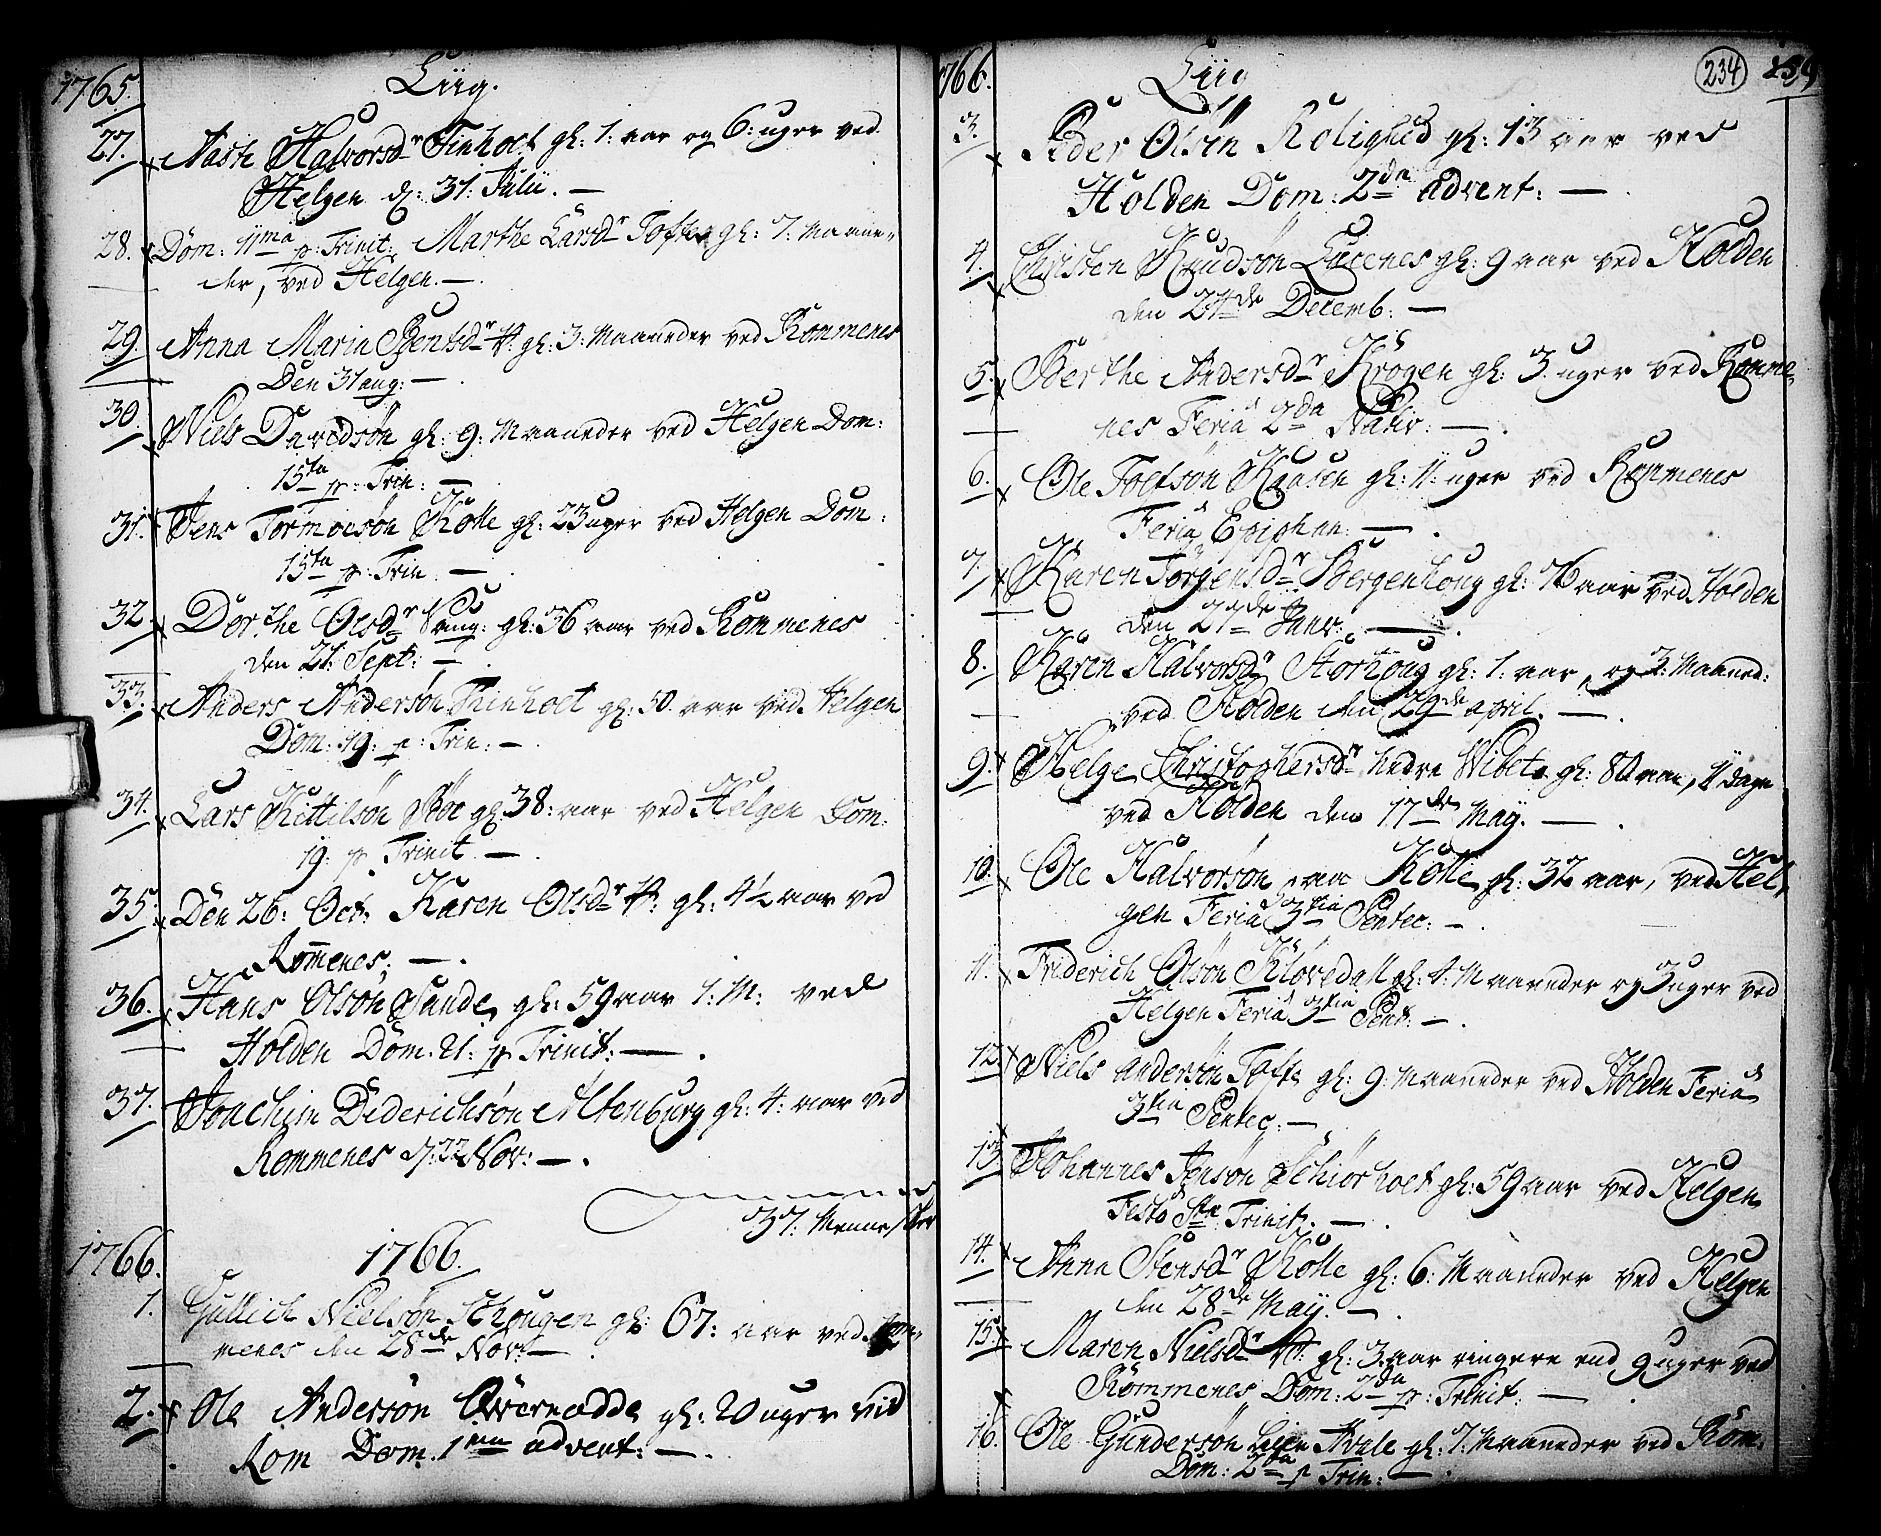 SAKO, Holla kirkebøker, F/Fa/L0001: Ministerialbok nr. 1, 1717-1779, s. 234